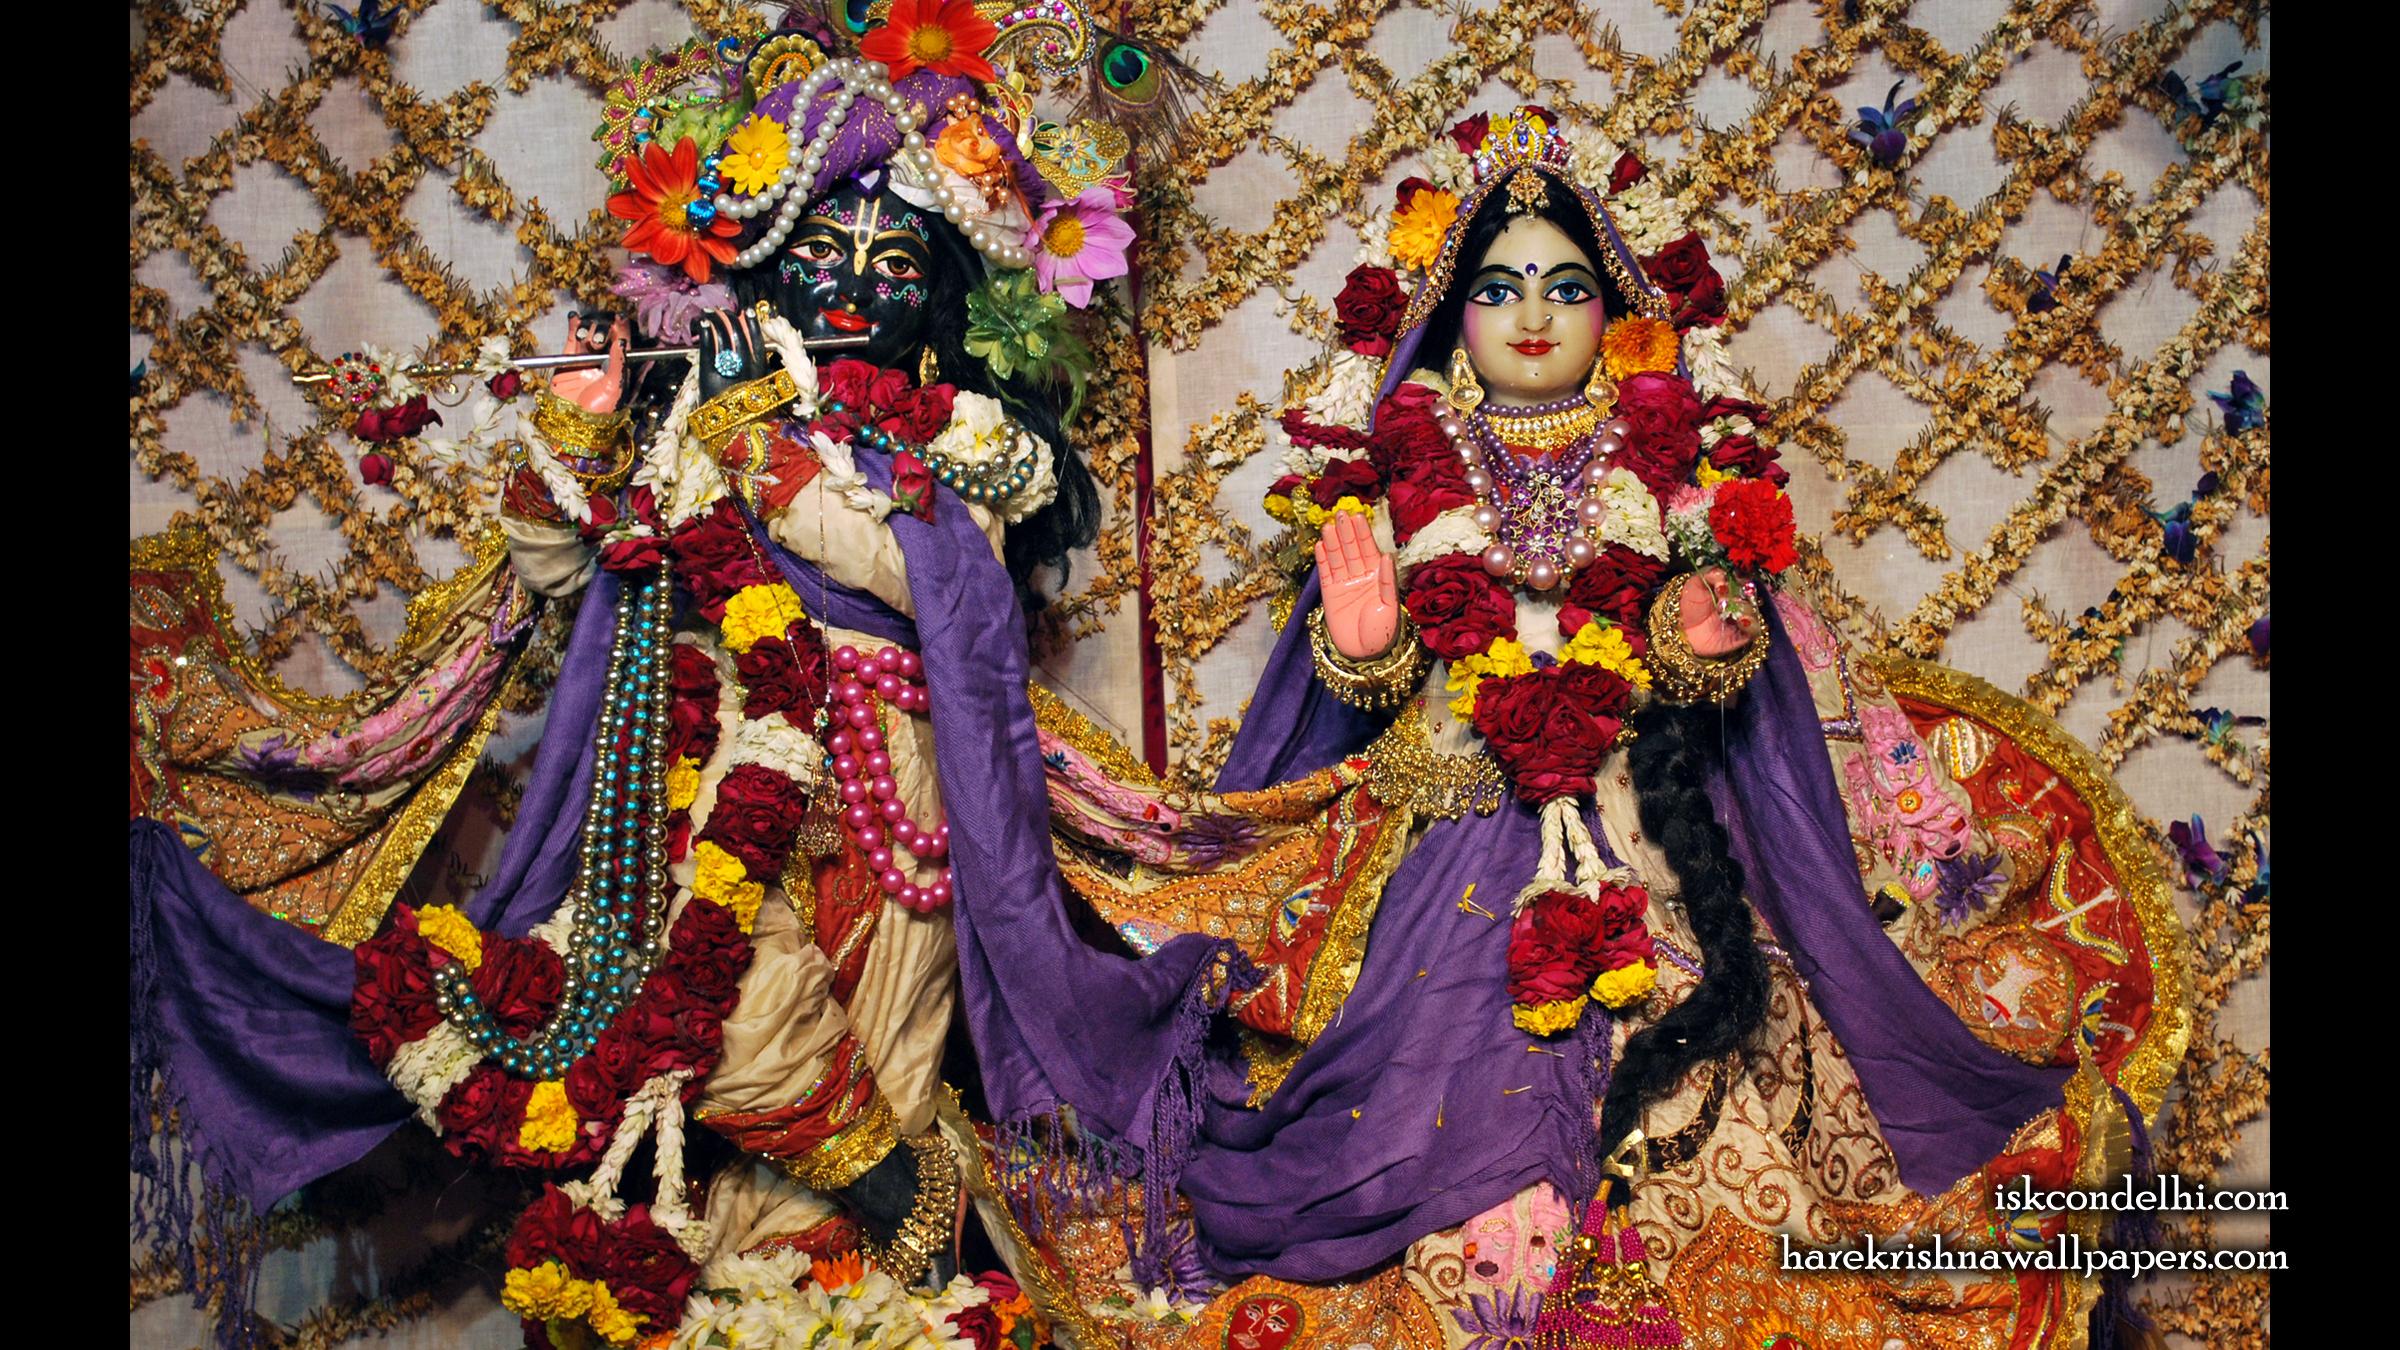 Sri Sri Radha Parthasarathi Wallpaper (005) Size 2400x1350 Download